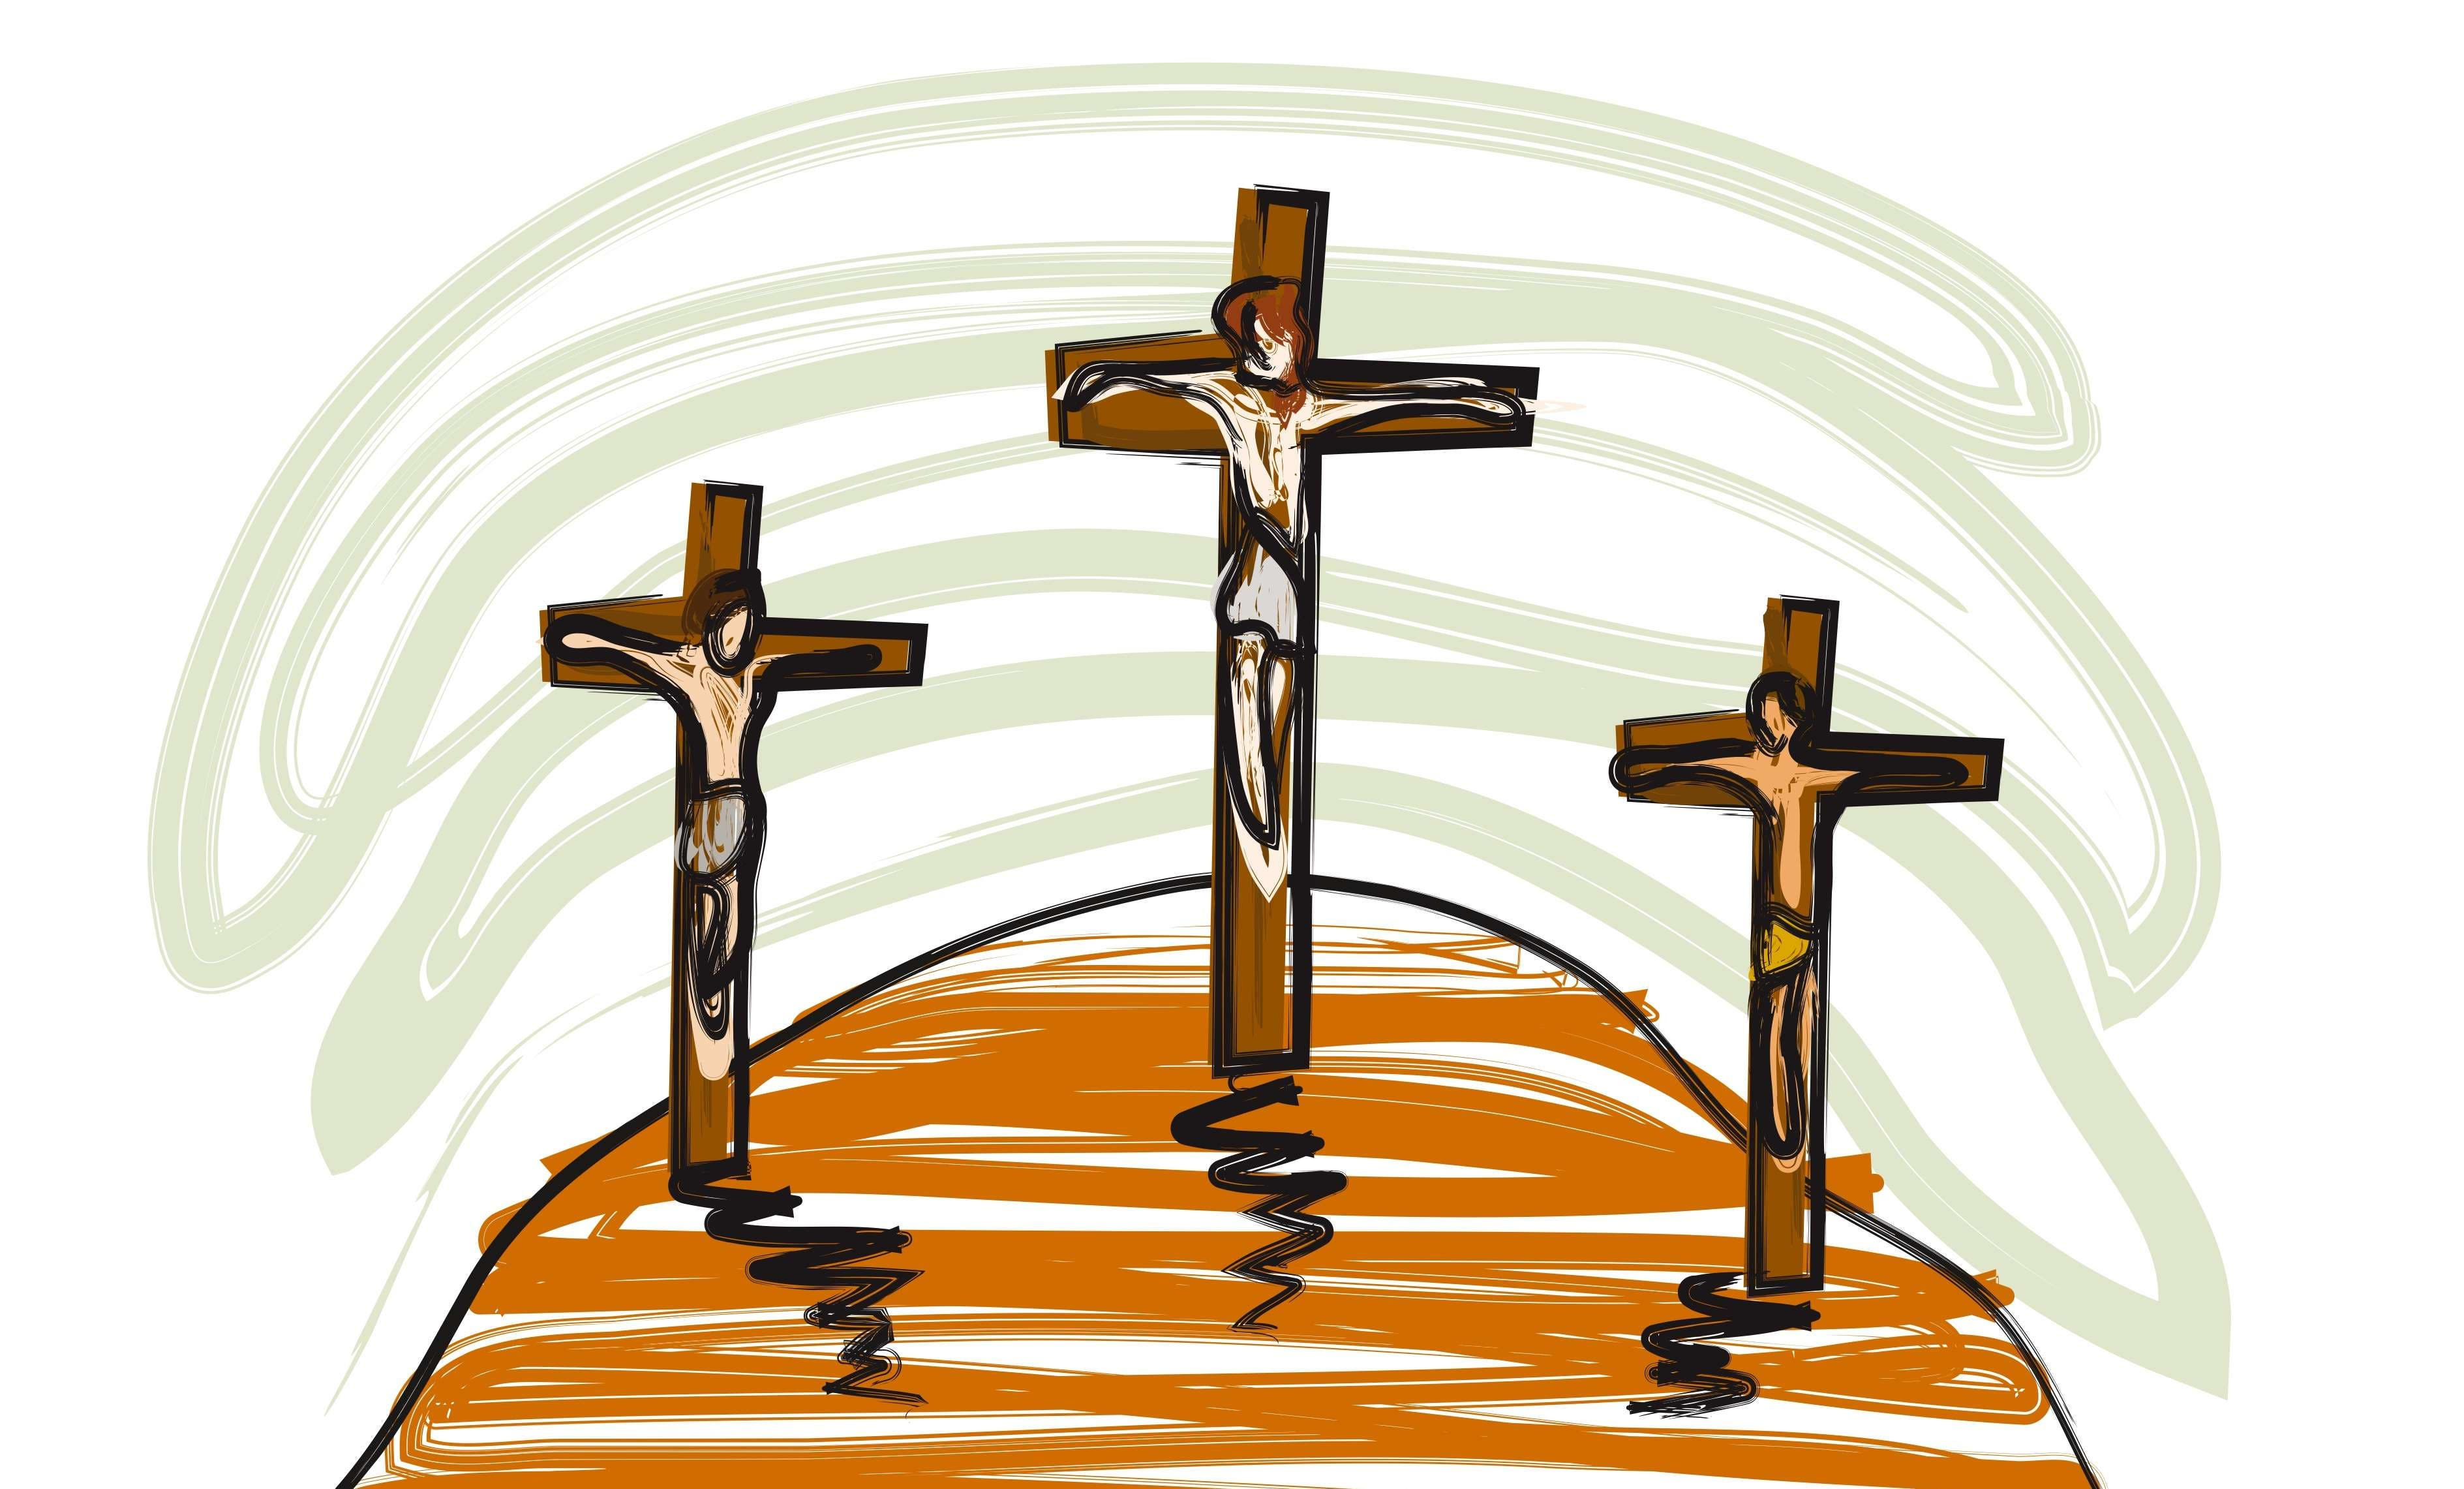 viacrucis camino de misericordia opini243n religi243n